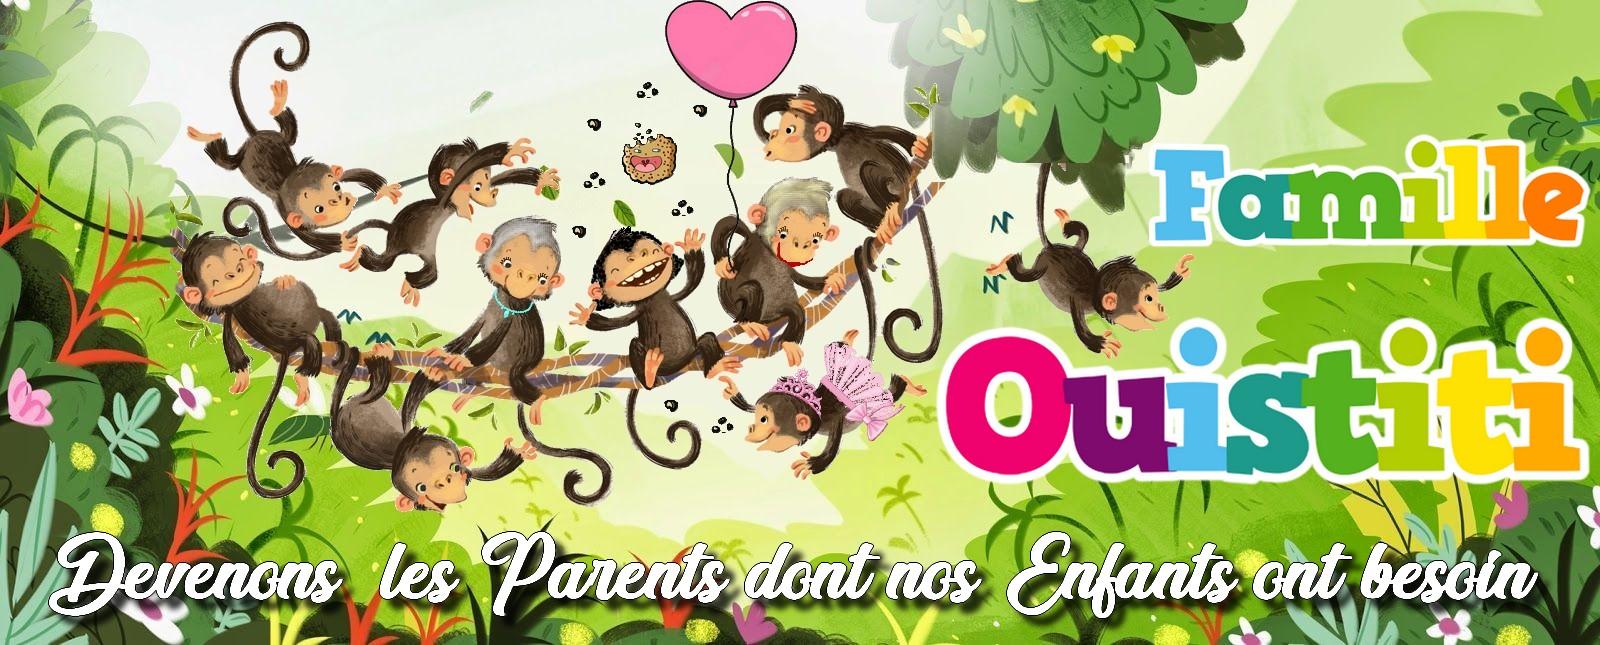 Famille Oustiti